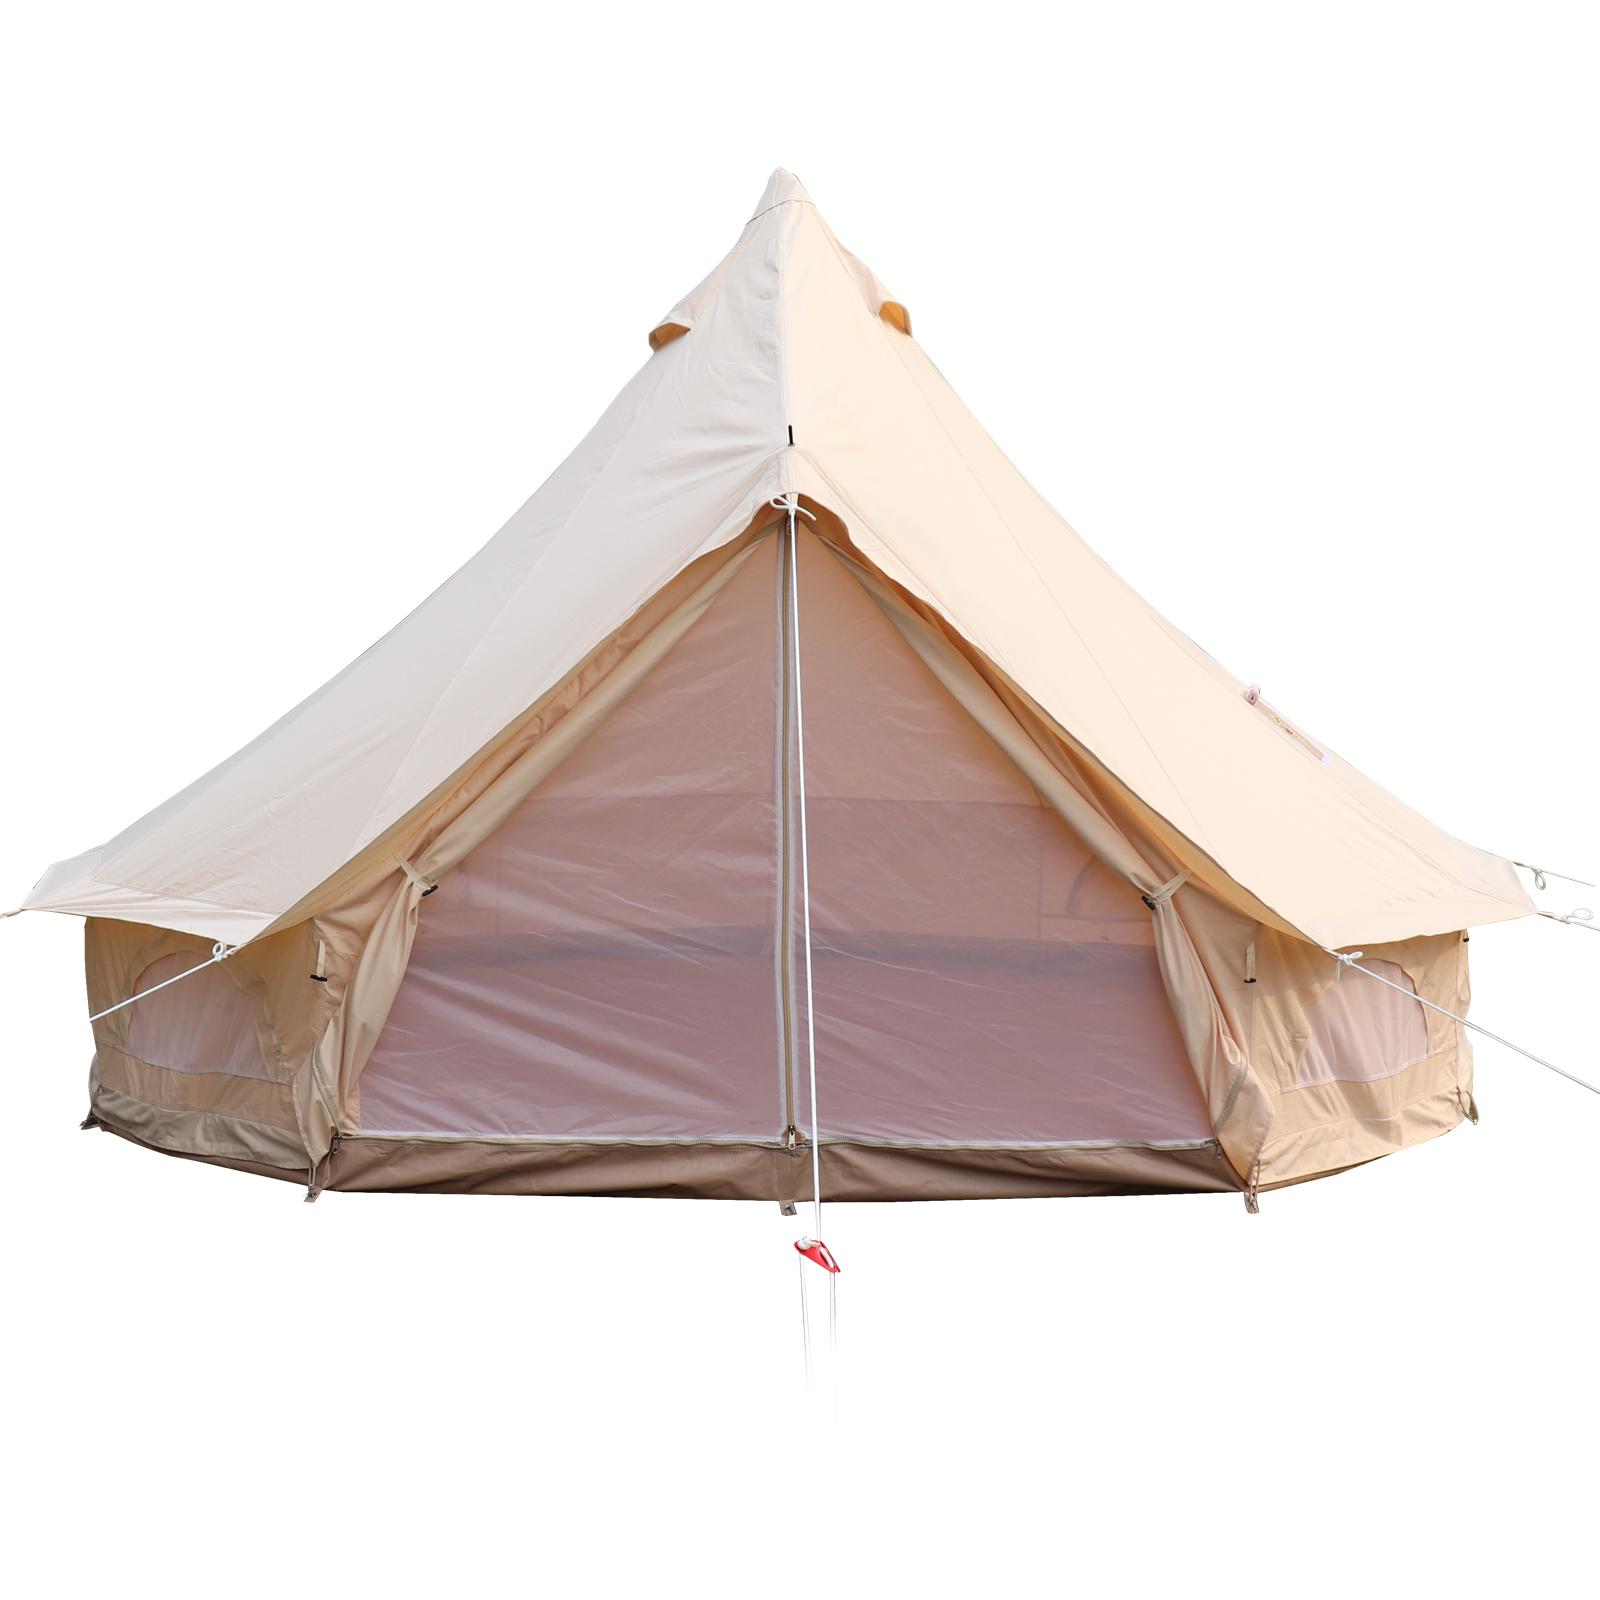 4-Season-Bell-Tent-3-4-5-6M-Waterproof-Cotton-Canvas-Glamping-Camping-Beach-US thumbnail 22